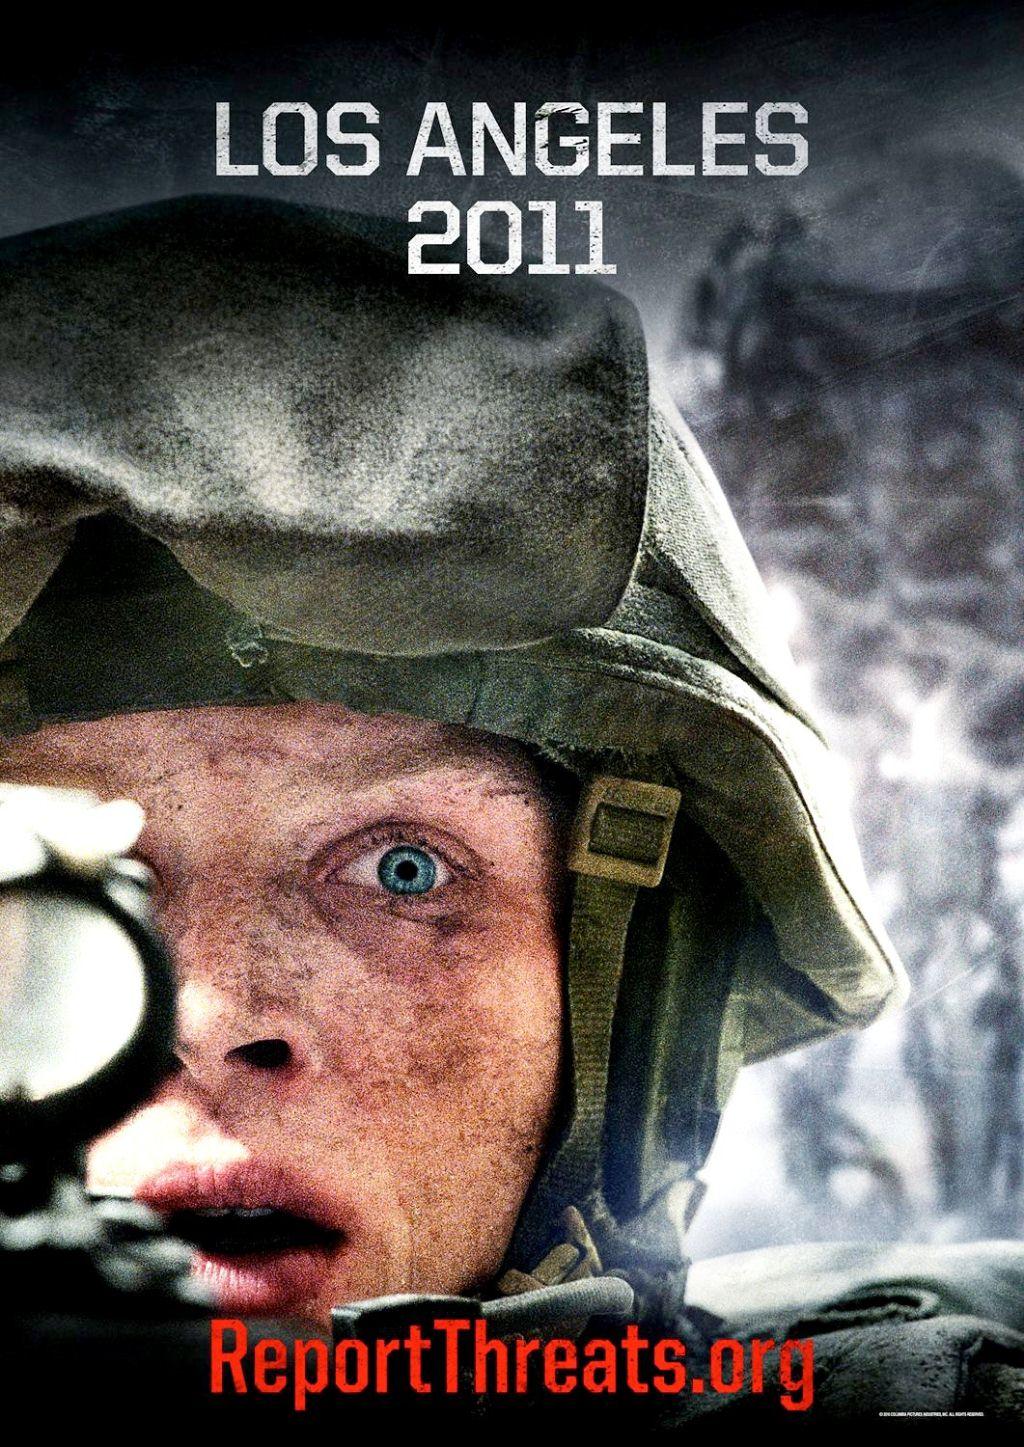 http://4.bp.blogspot.com/_yK1lAMJu3nI/TOPajSyQbdI/AAAAAAAAAUM/2lYLXiIP9xQ/s1600/battlelosangeles.jpg